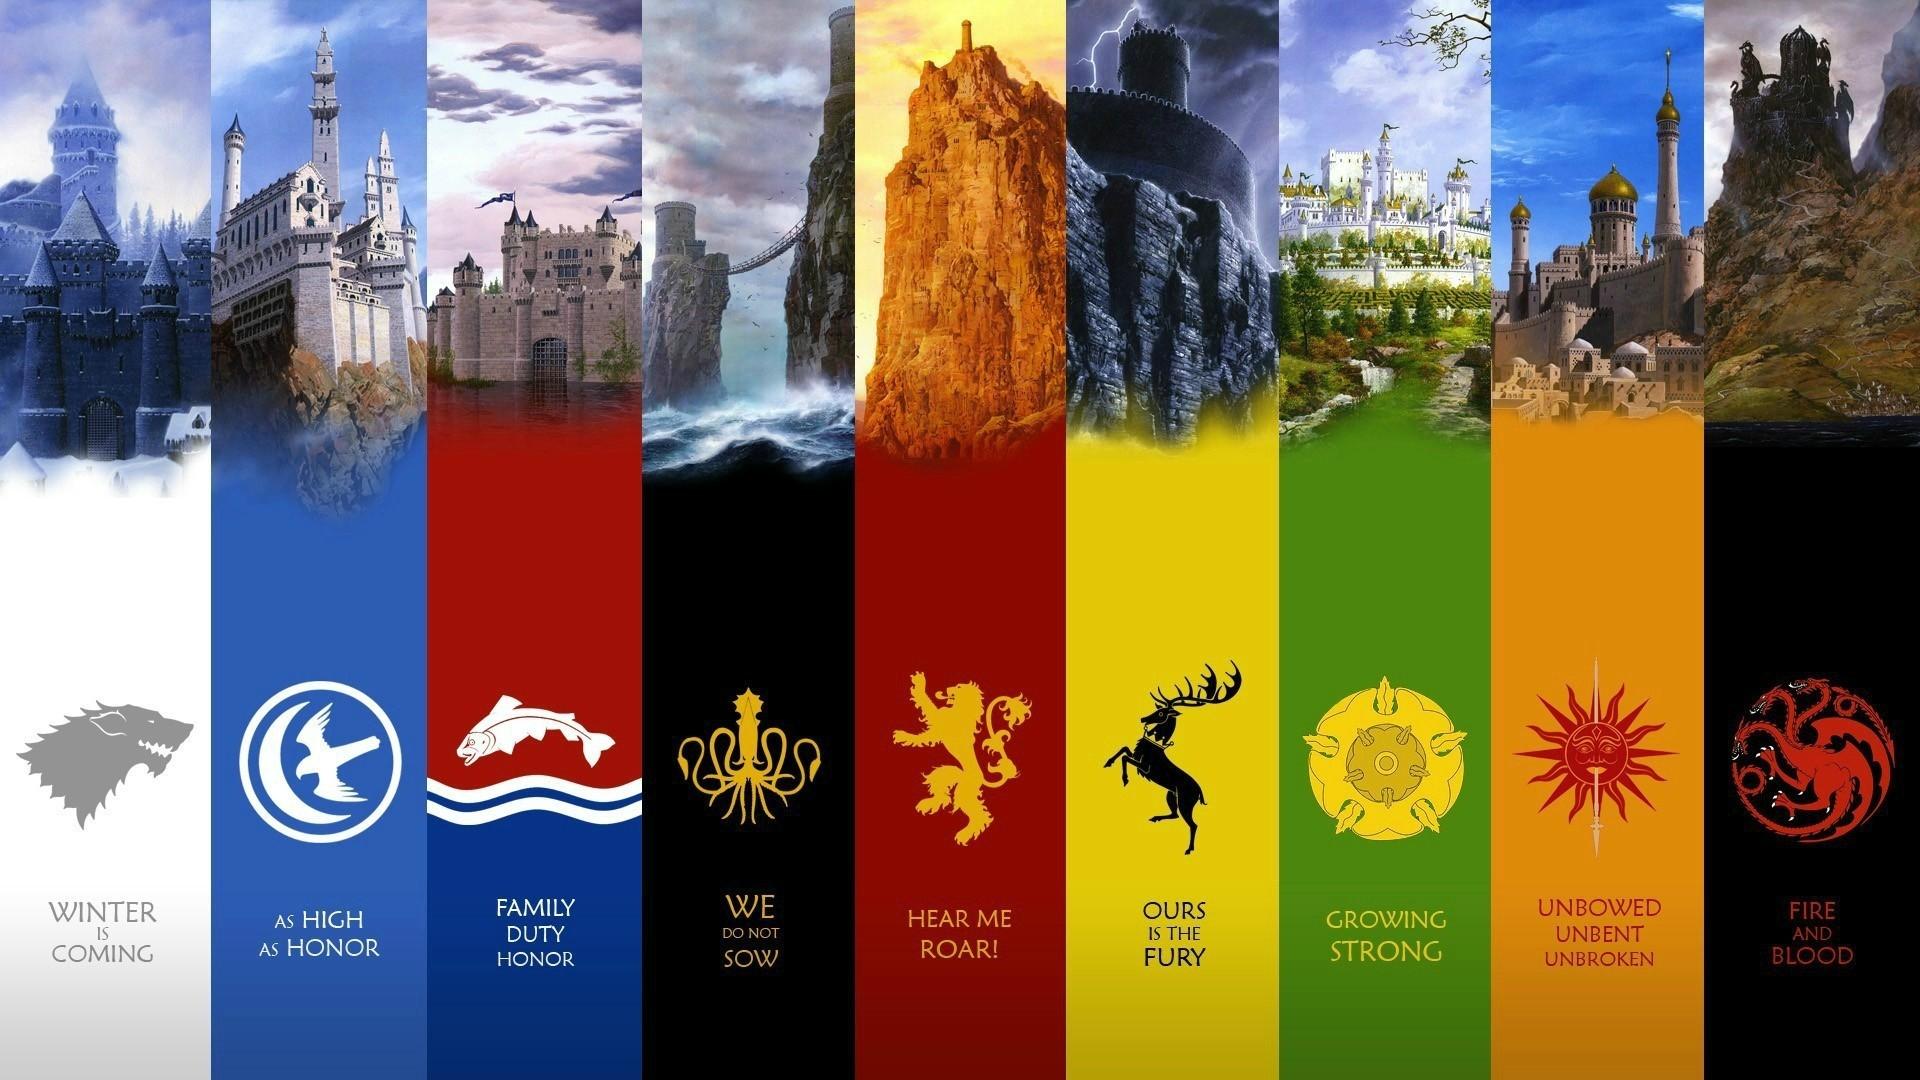 House Stark Winter Is Coming House Arryn Wallpaper 5819 –  ChainPixel.com